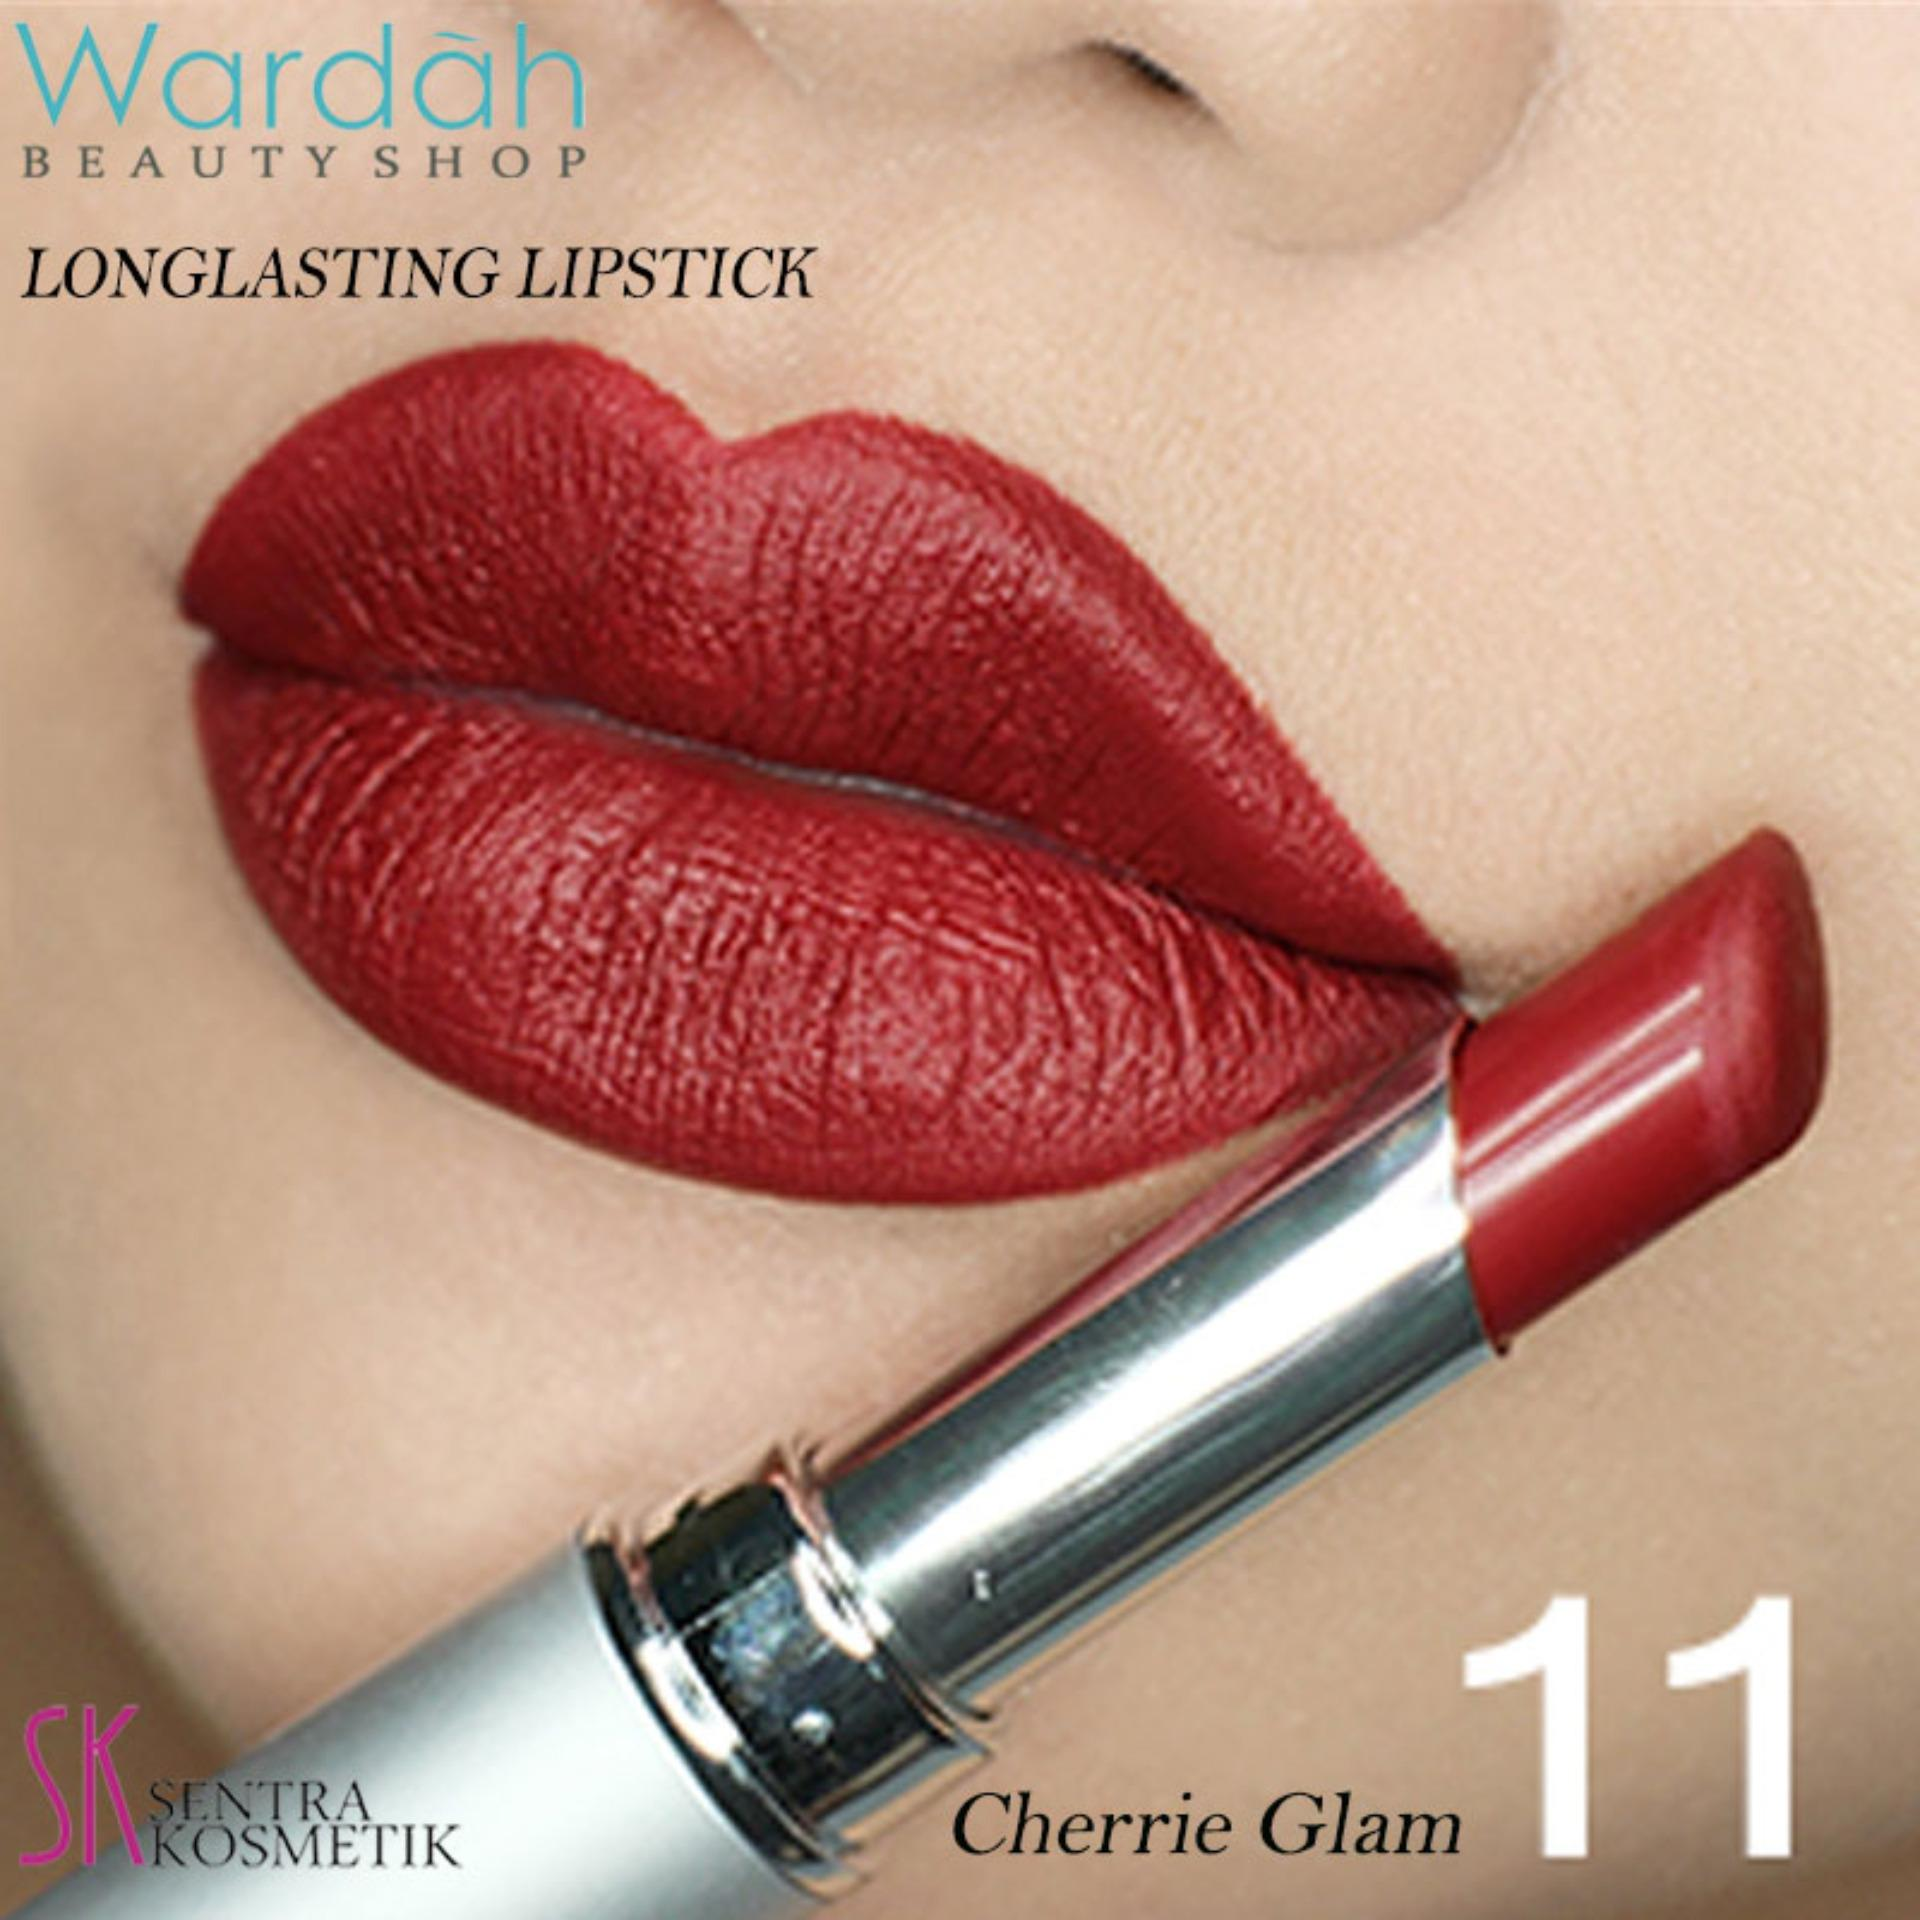 Wardah LONGLASTING Lipstick No.11 Cherrie Glam